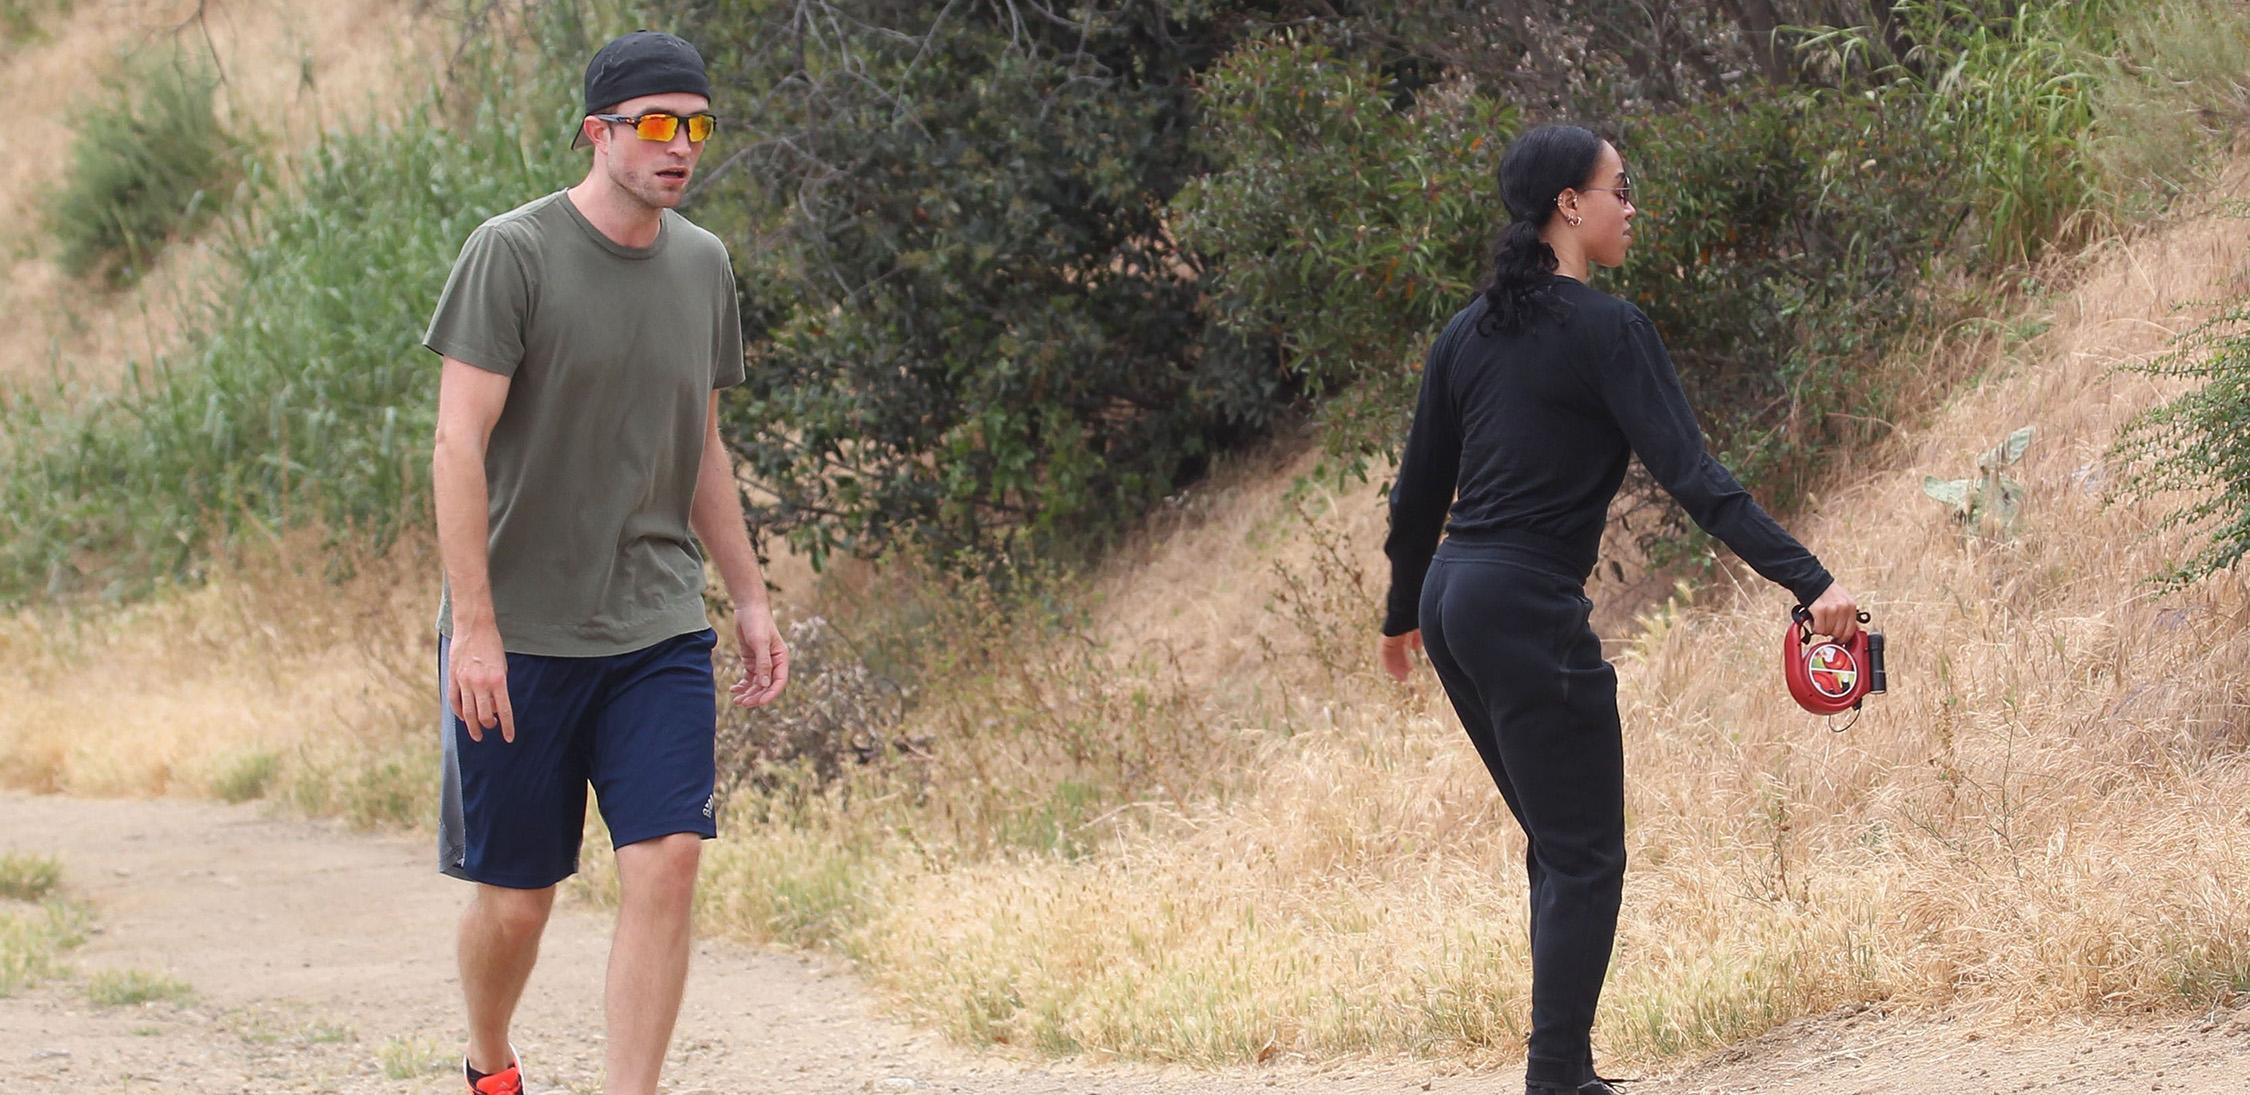 *EXCLUSIVE* Robert Pattinson and FKA Twigs work up a sweat in Malibu